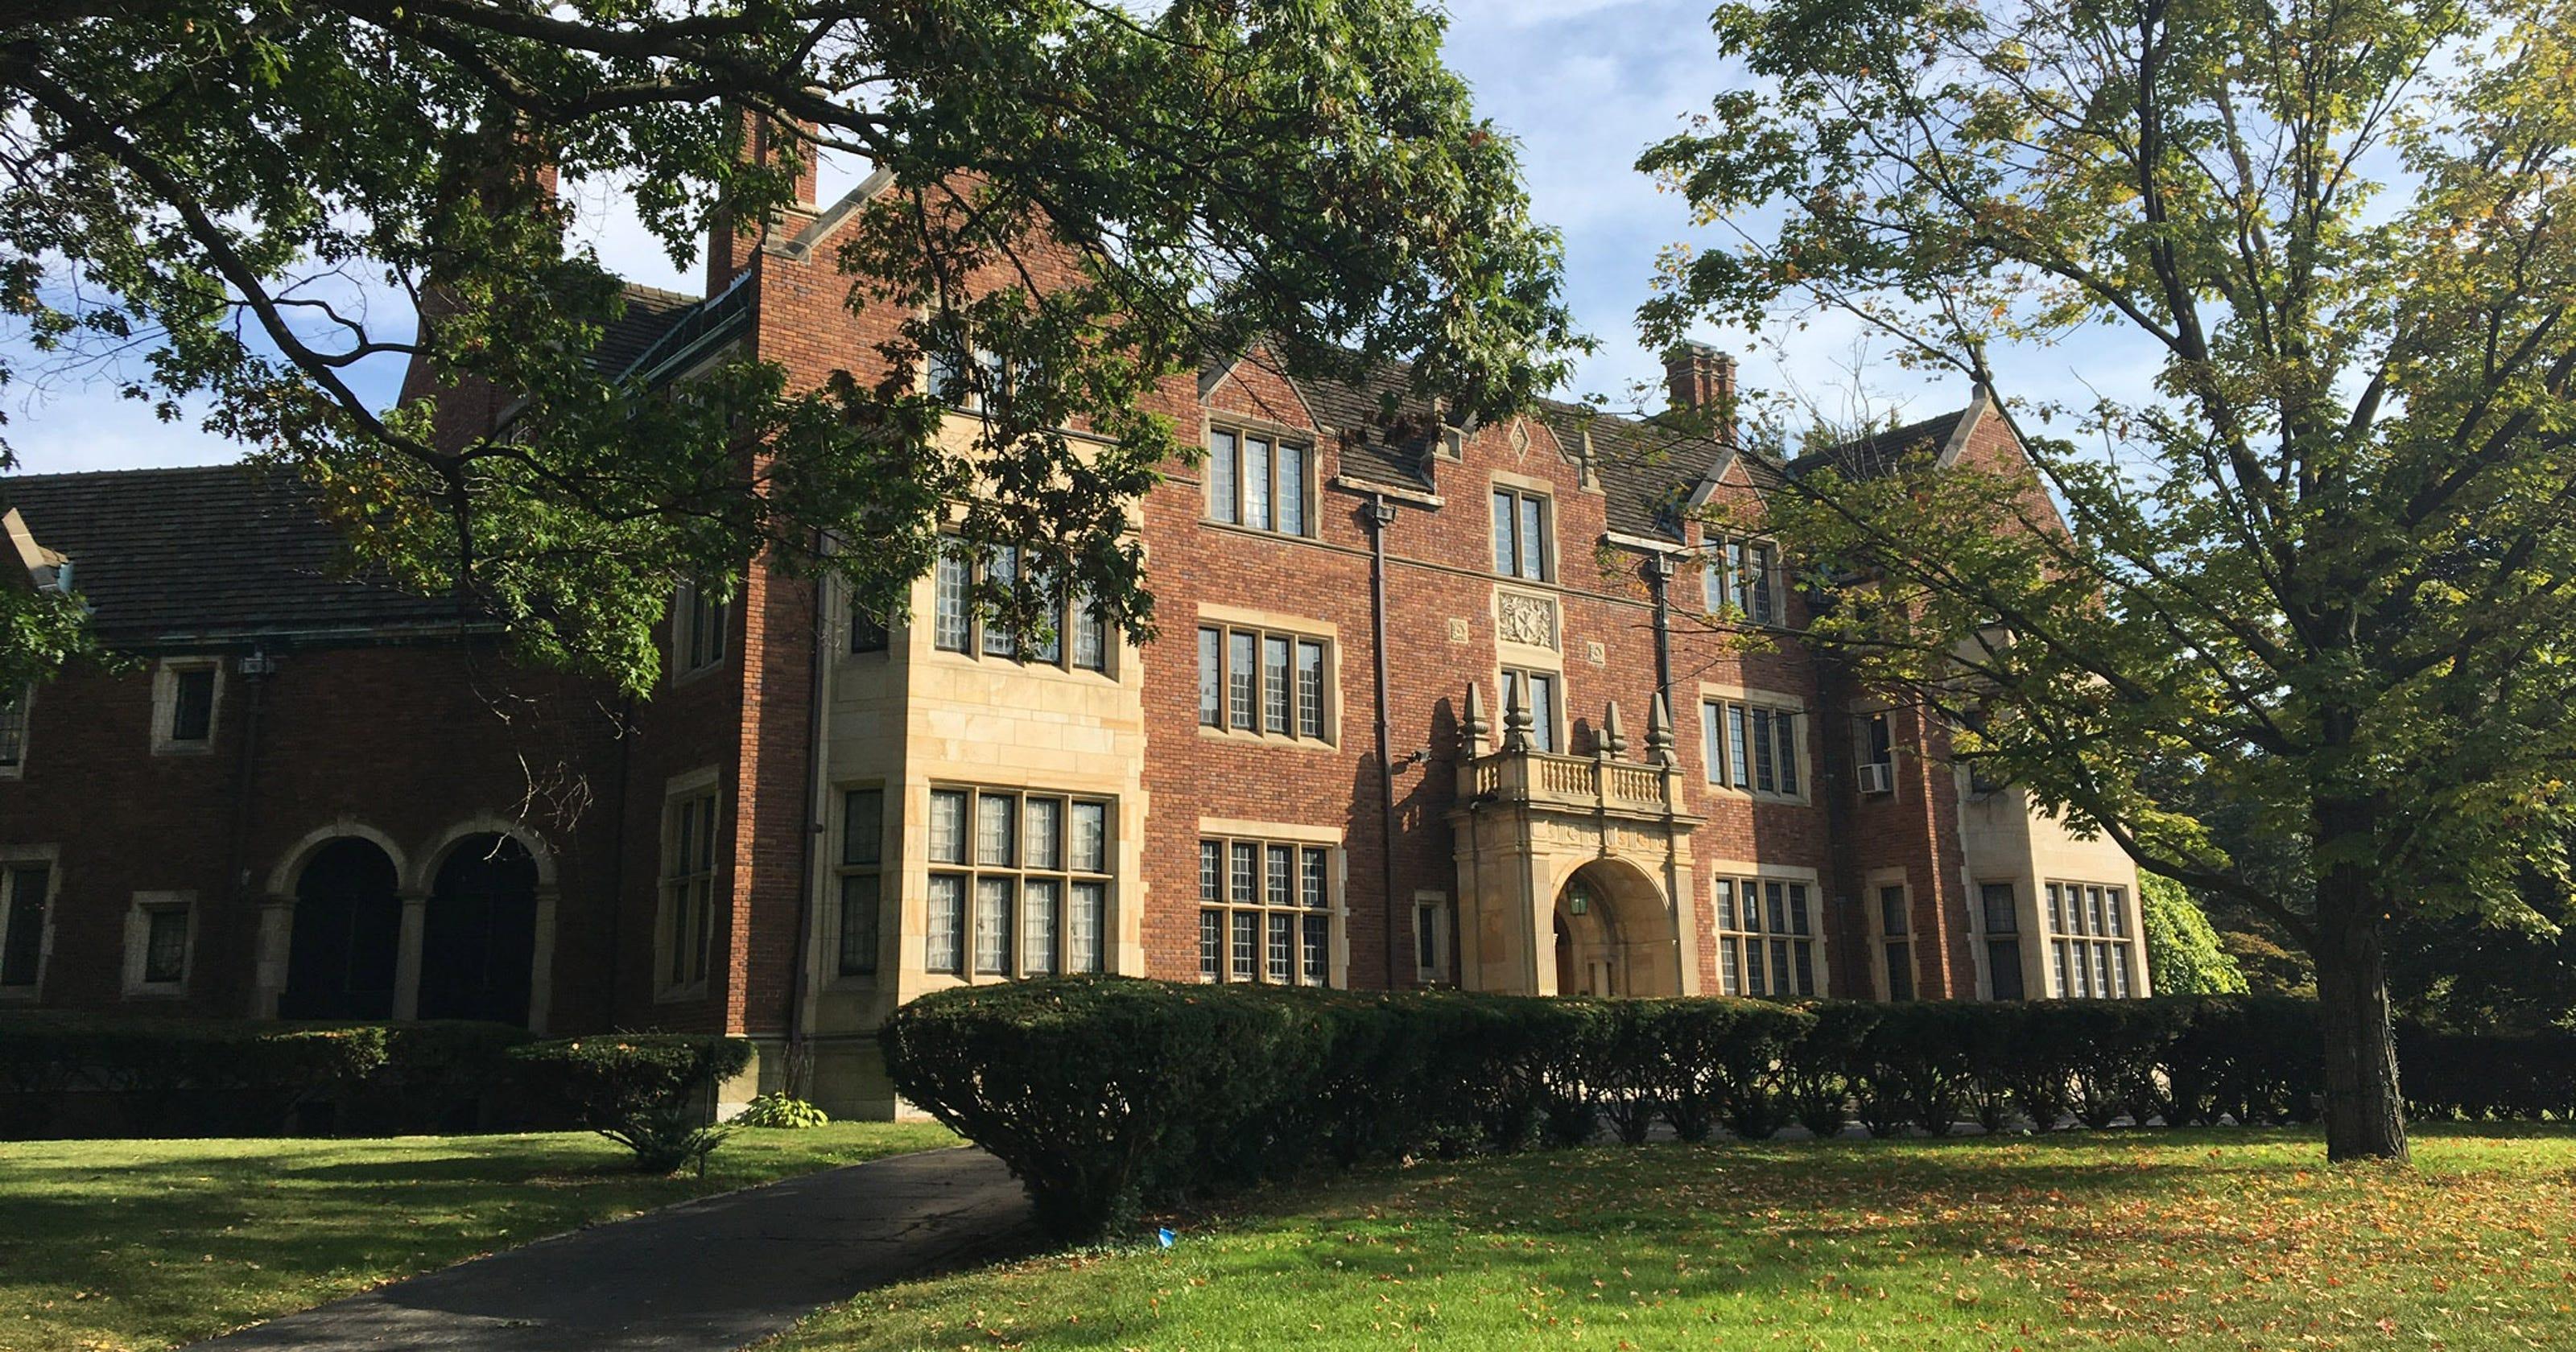 Detroit 39 s bishop 39 s mansion sells for 2 7 million for The bishop house